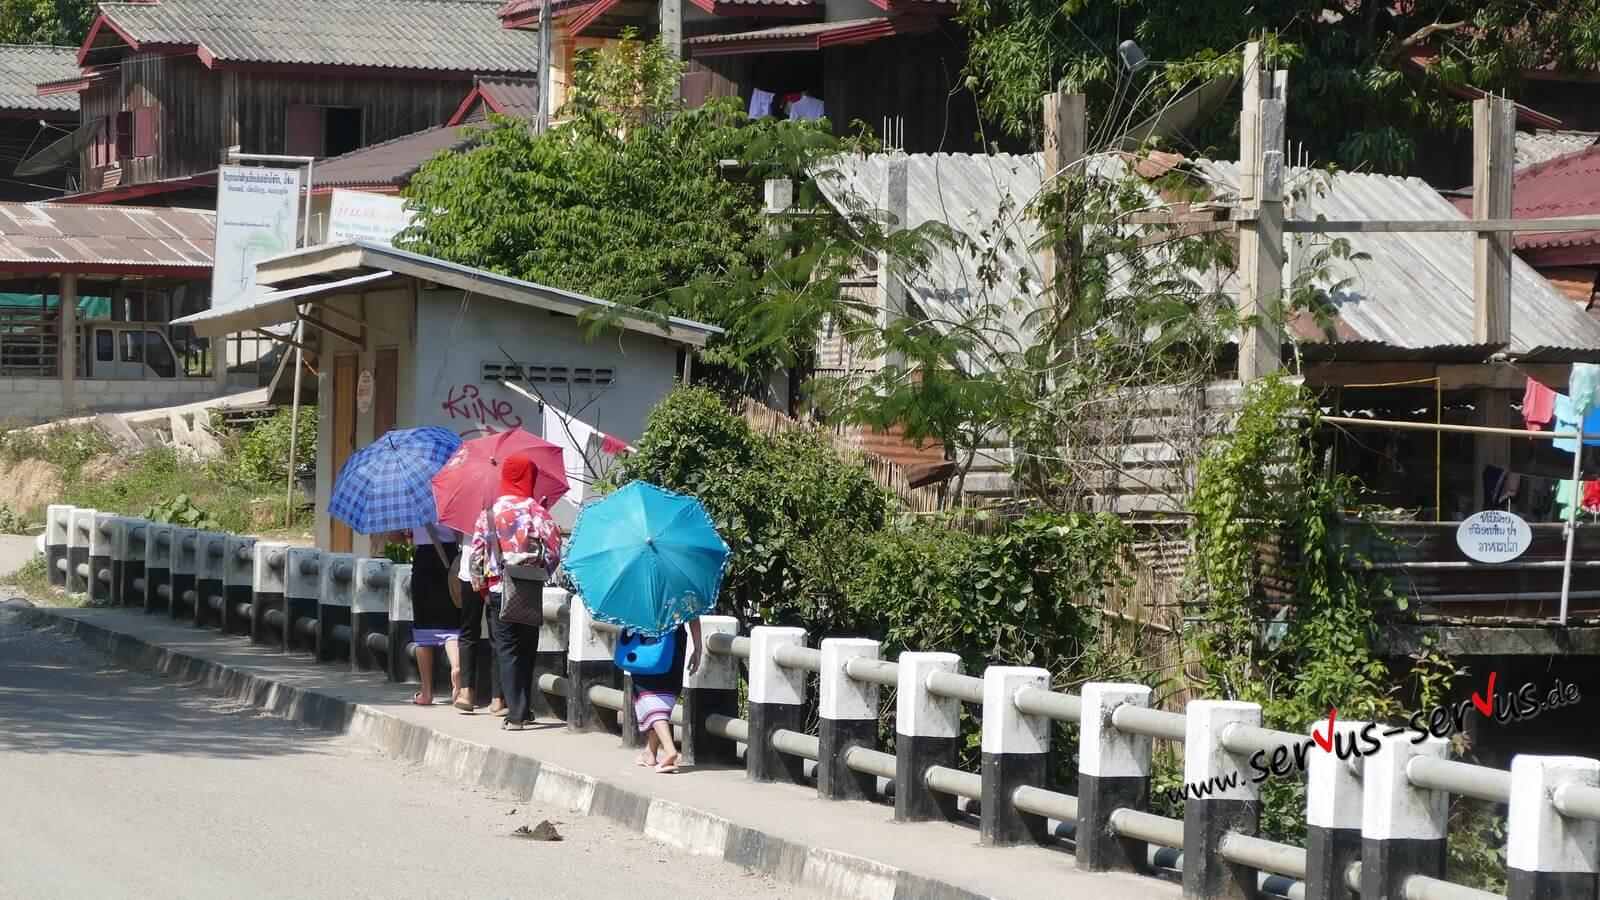 sonnenschirm kinder laos